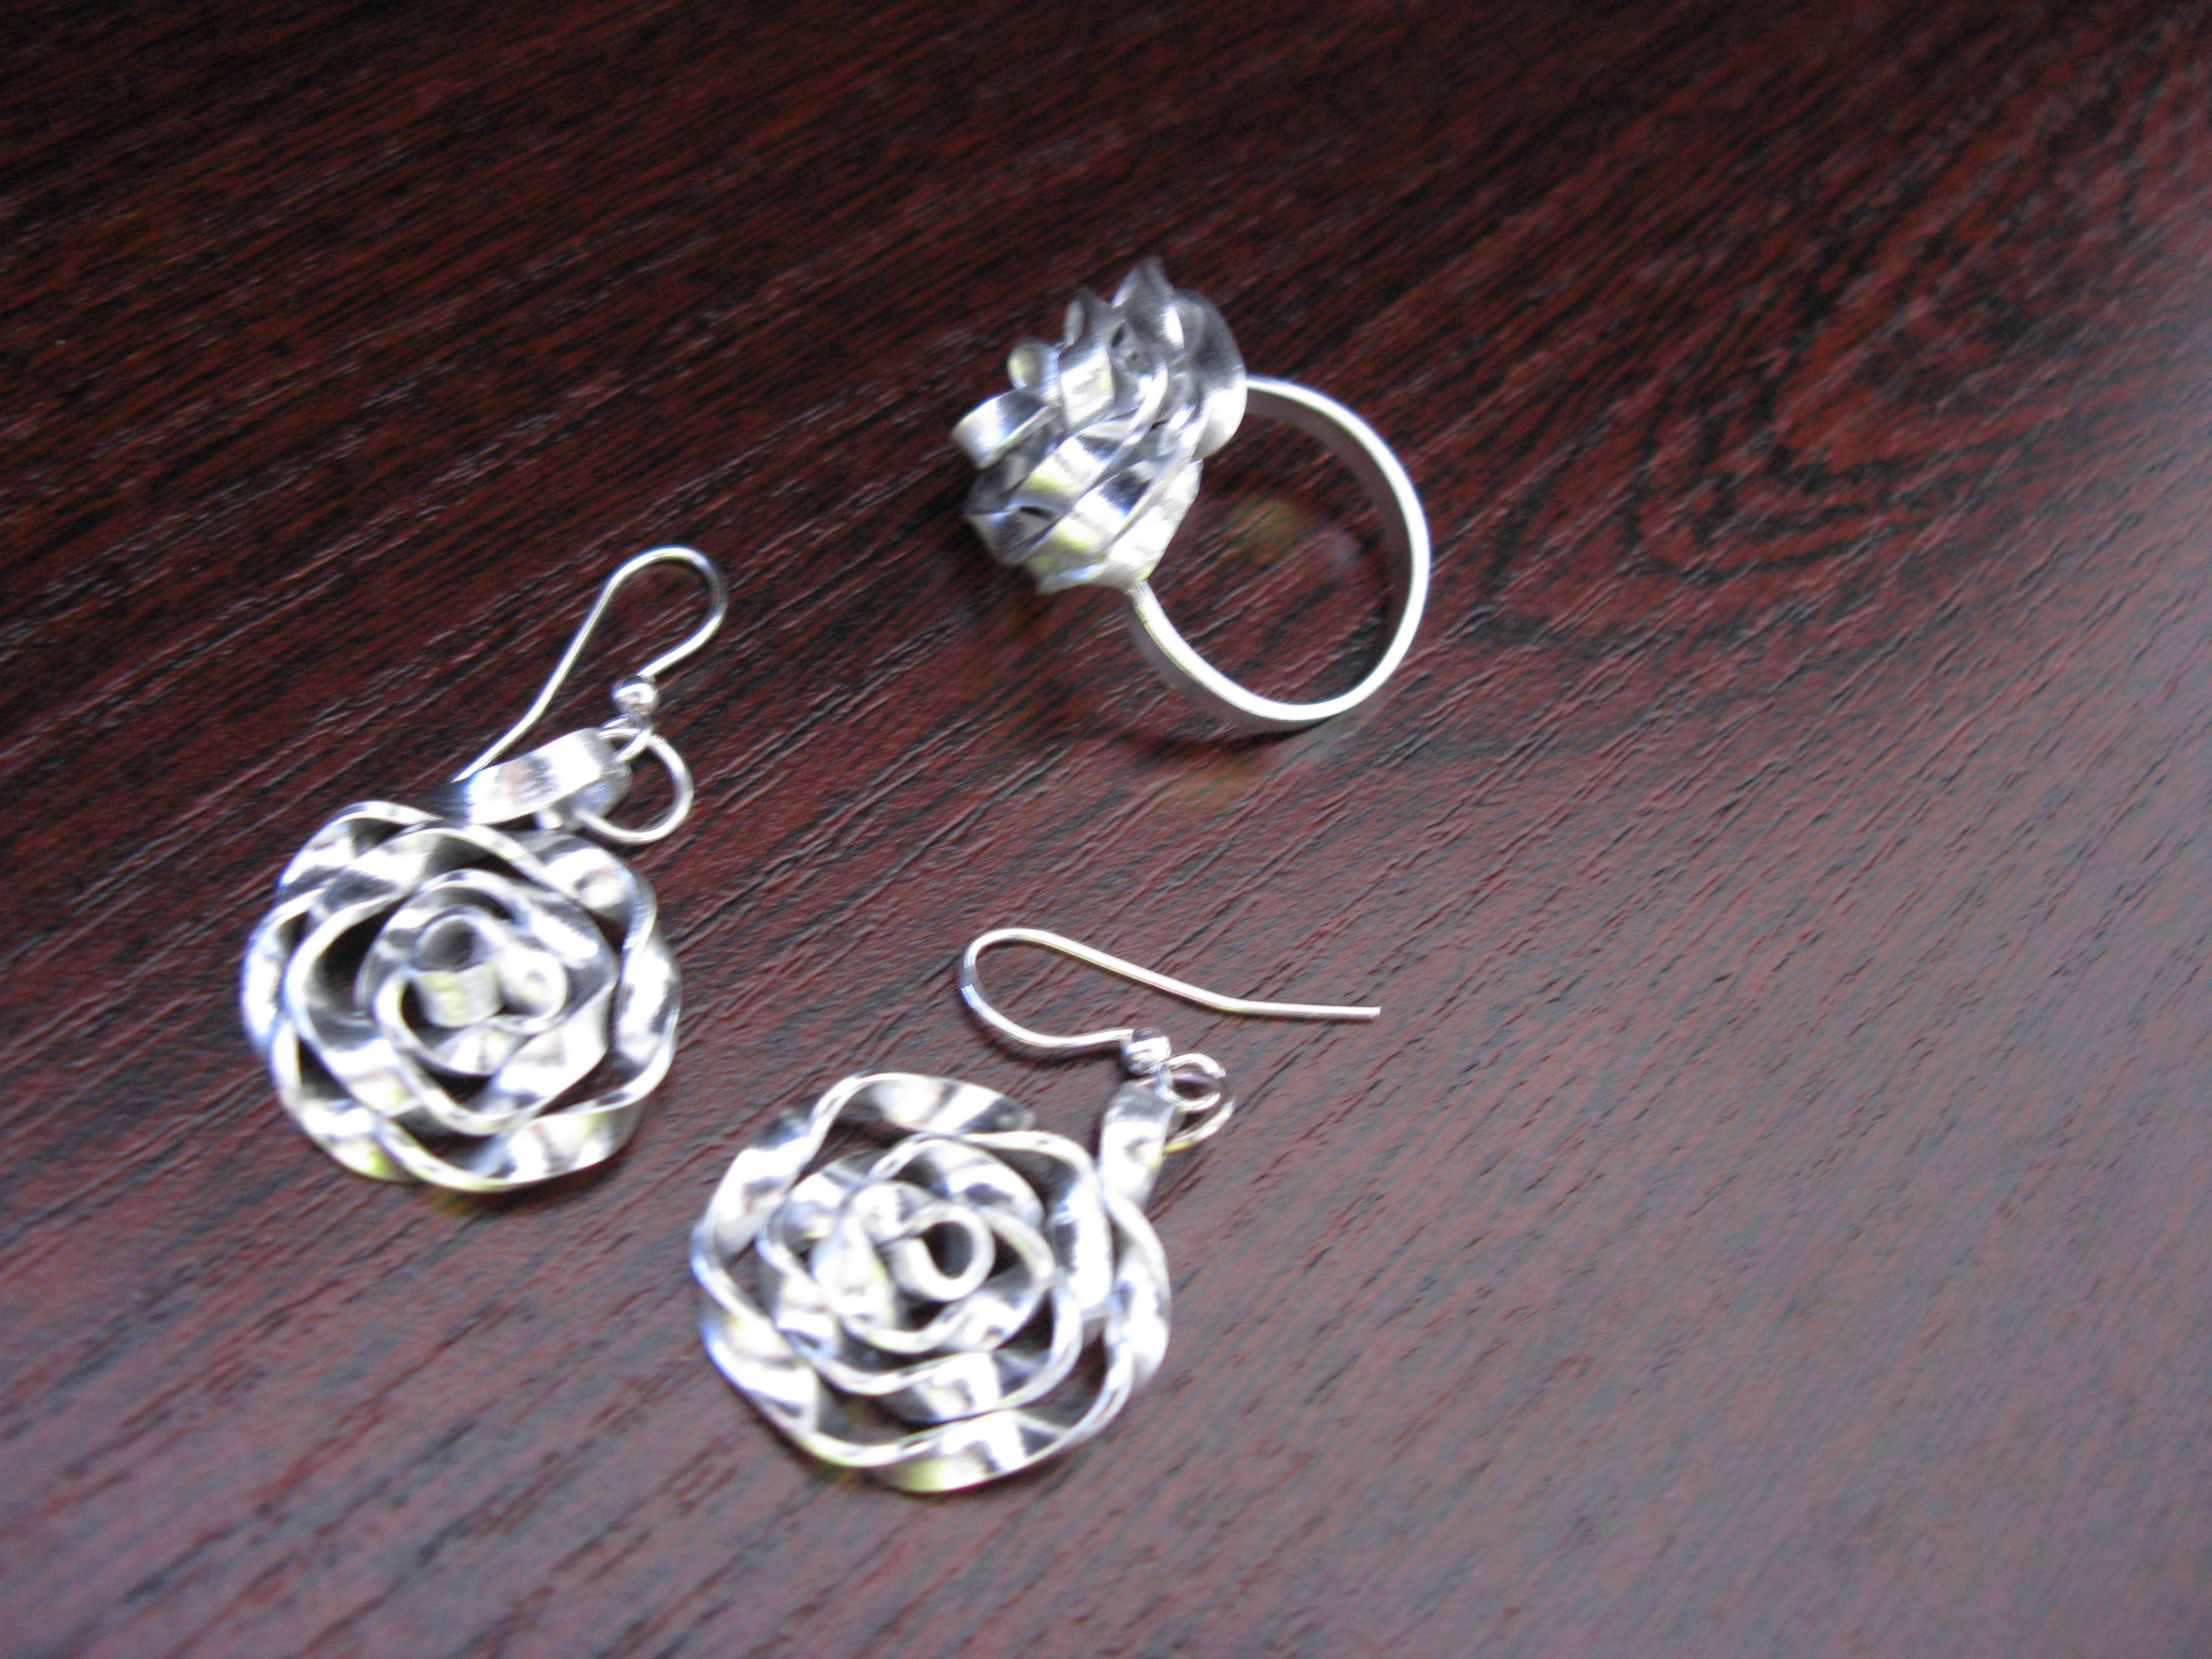 Flat Aluminium Wire, Rose Ring And Earrings